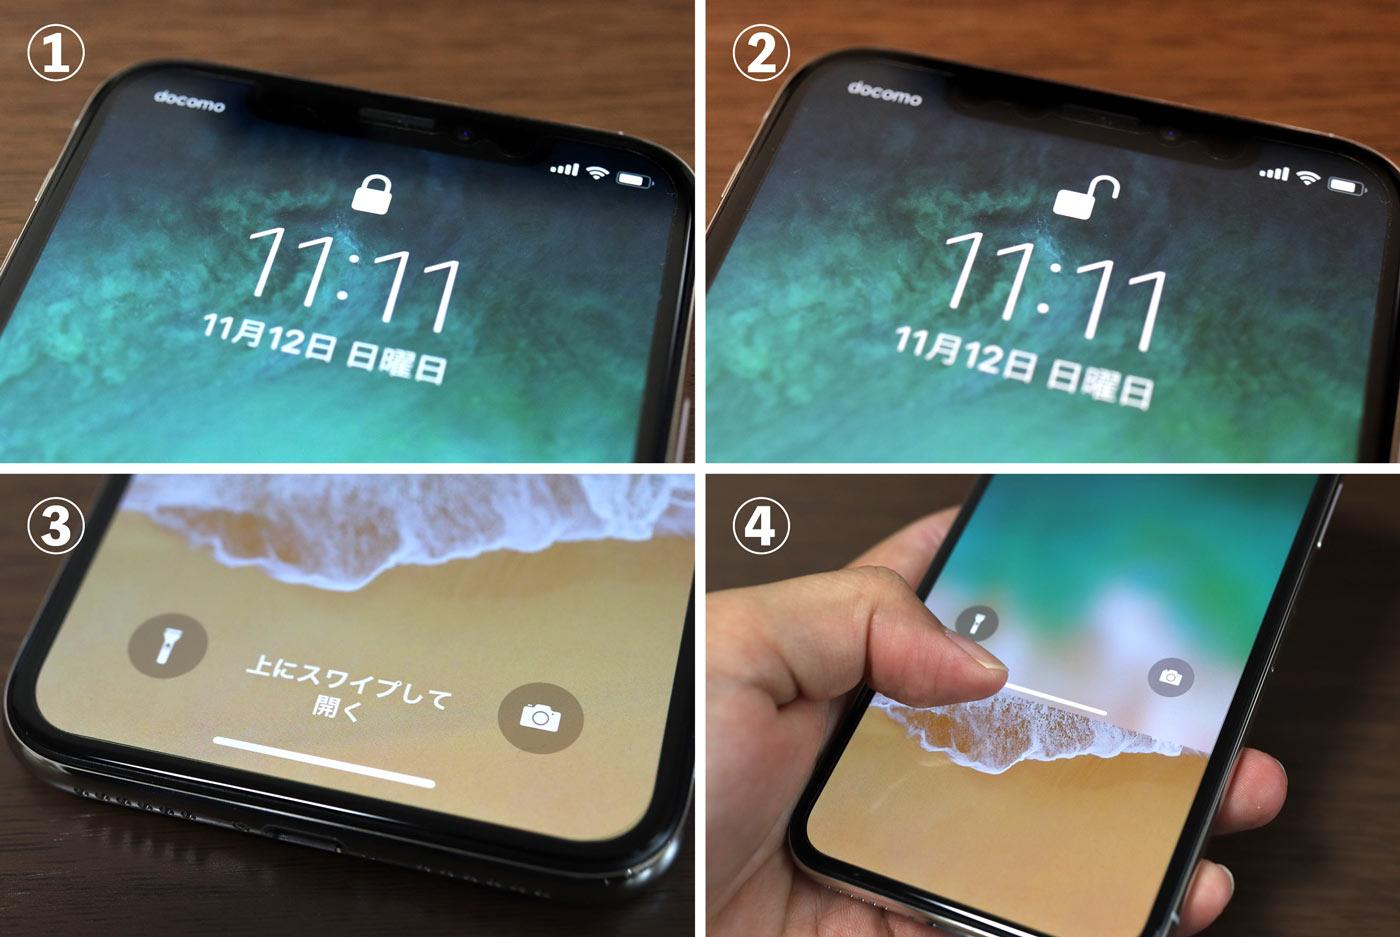 iPhone Xのロック画面解除の流れ